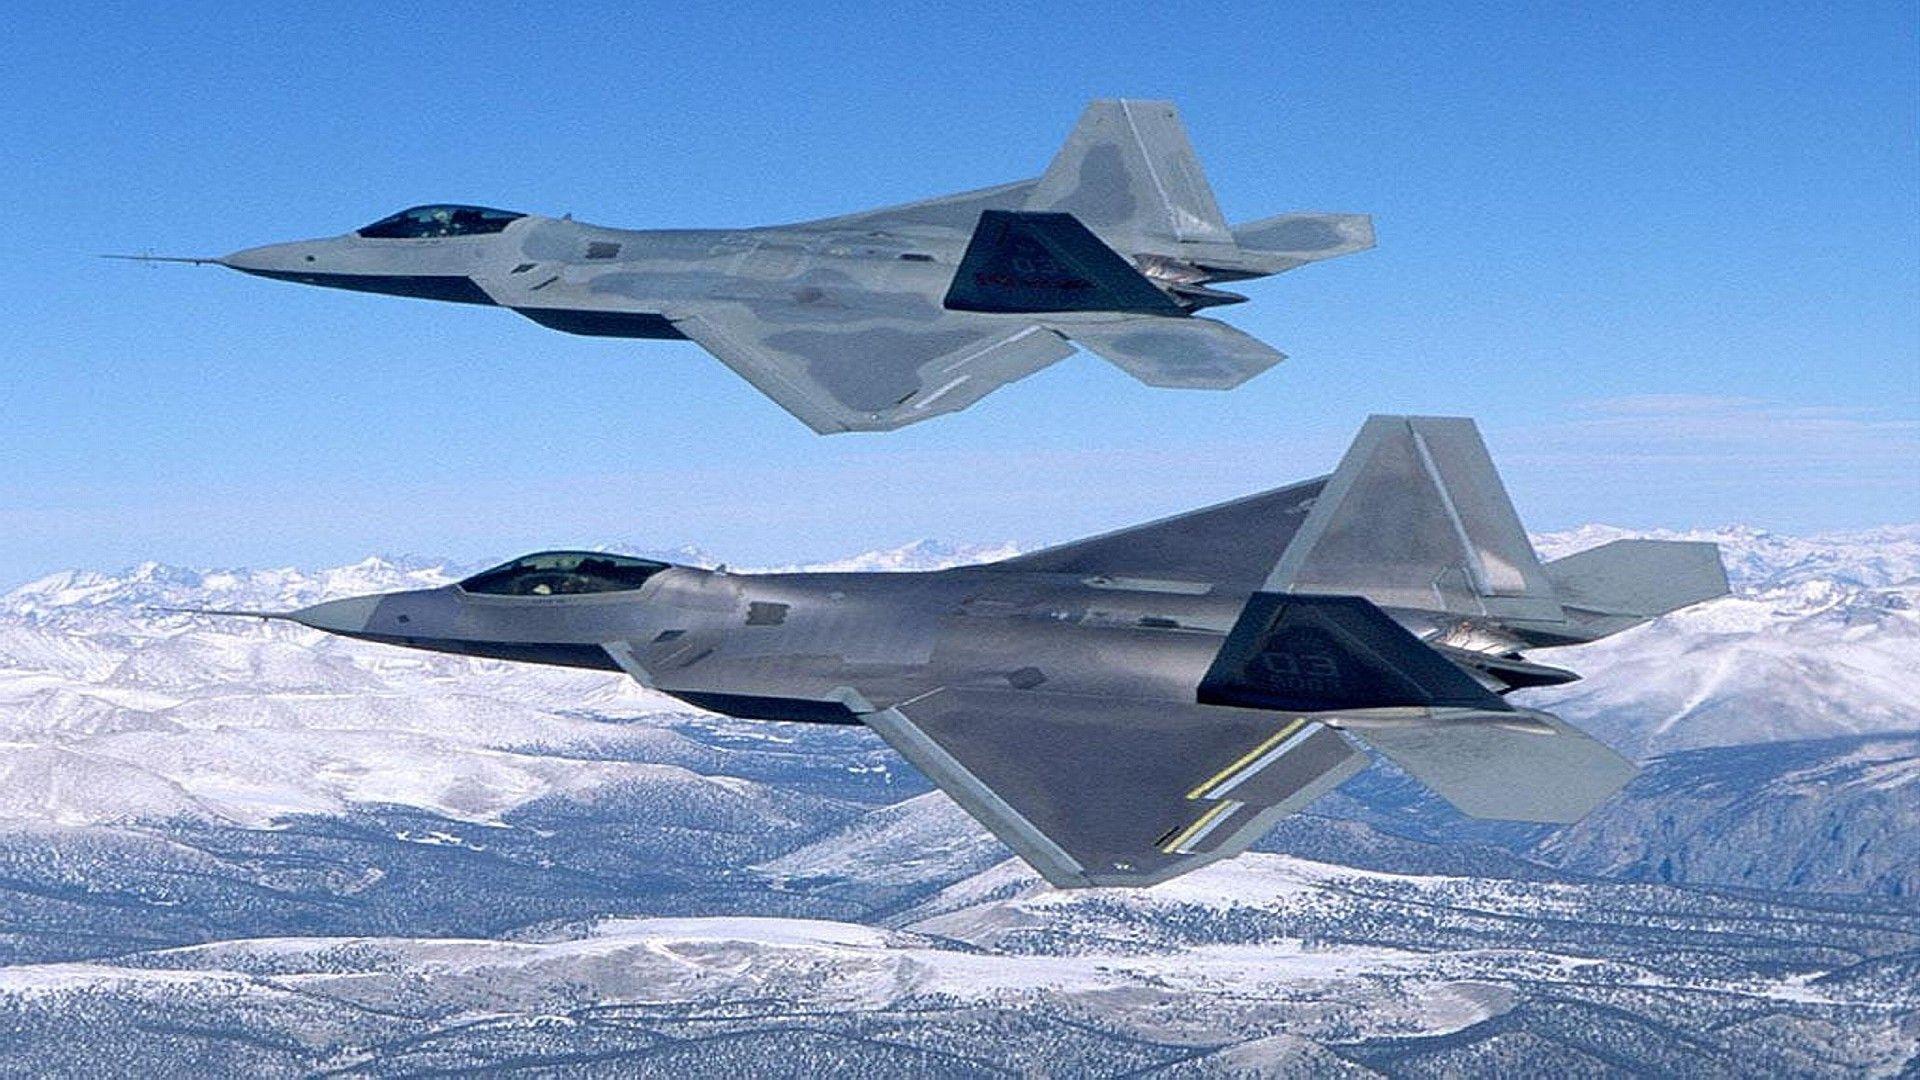 Lockheed Martin F Raptor Desktop Wallpapers Hd 1600 1200 F 22